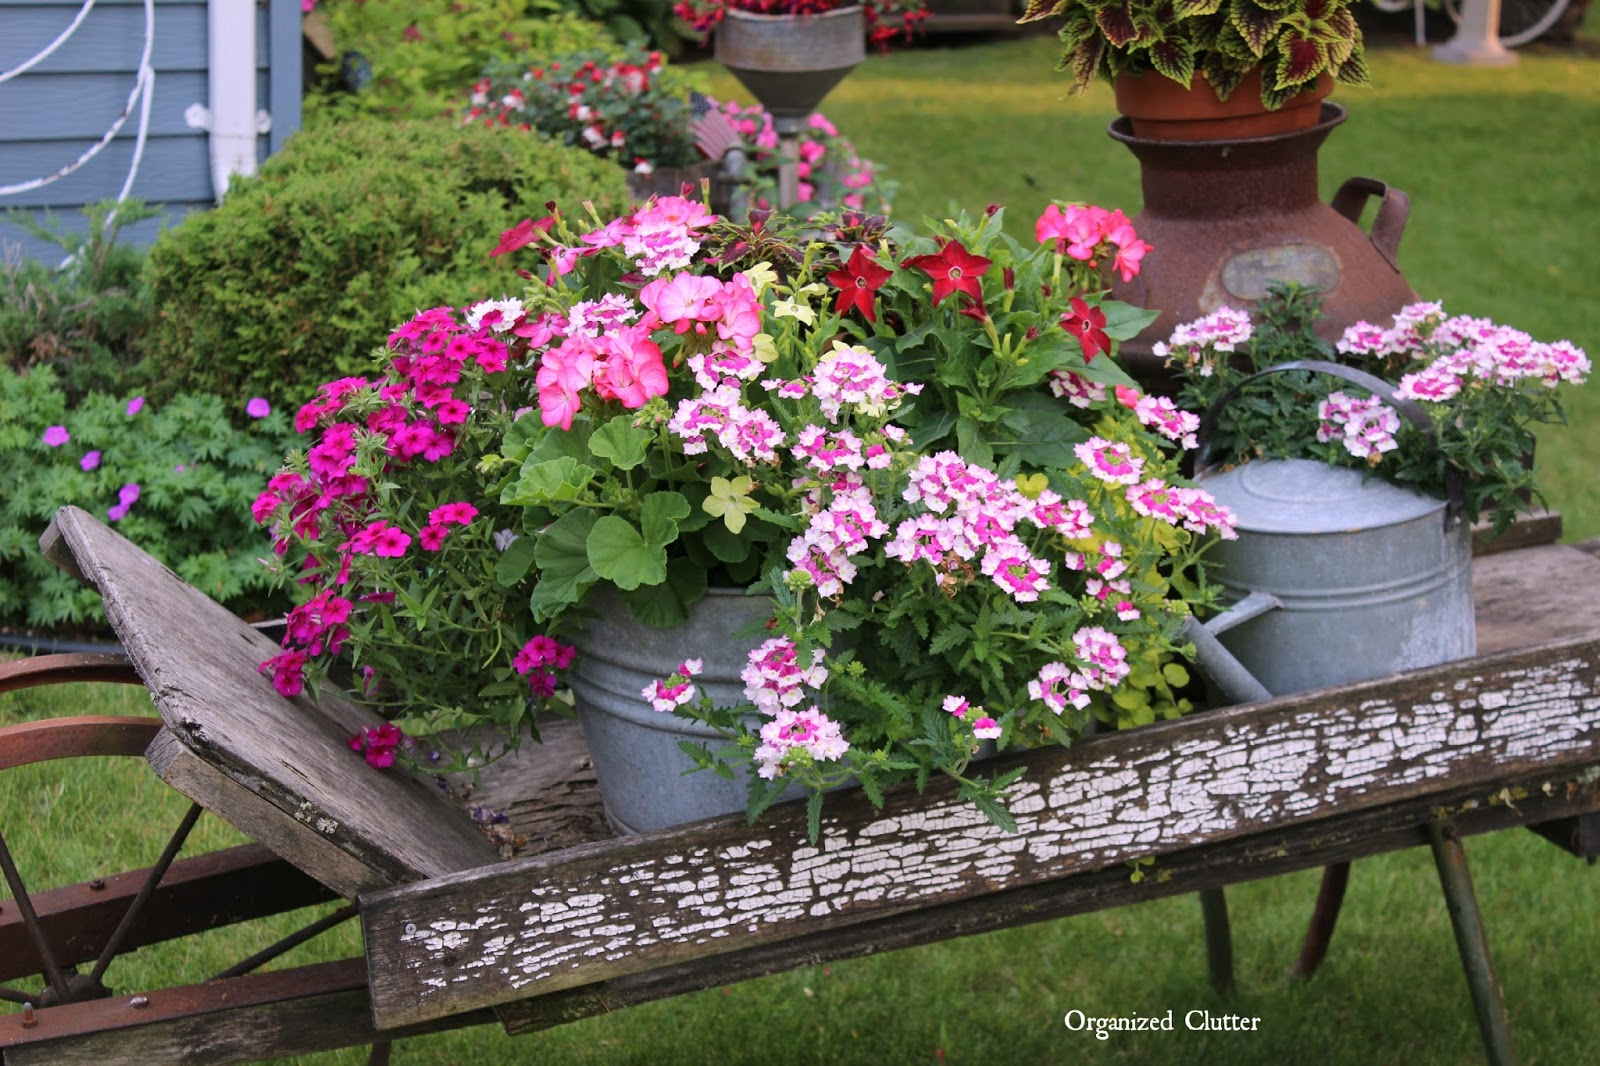 rustic garden wheelbarrow laundry tub planter ideas wwworganizedclutternet - Rustic Garden 2015